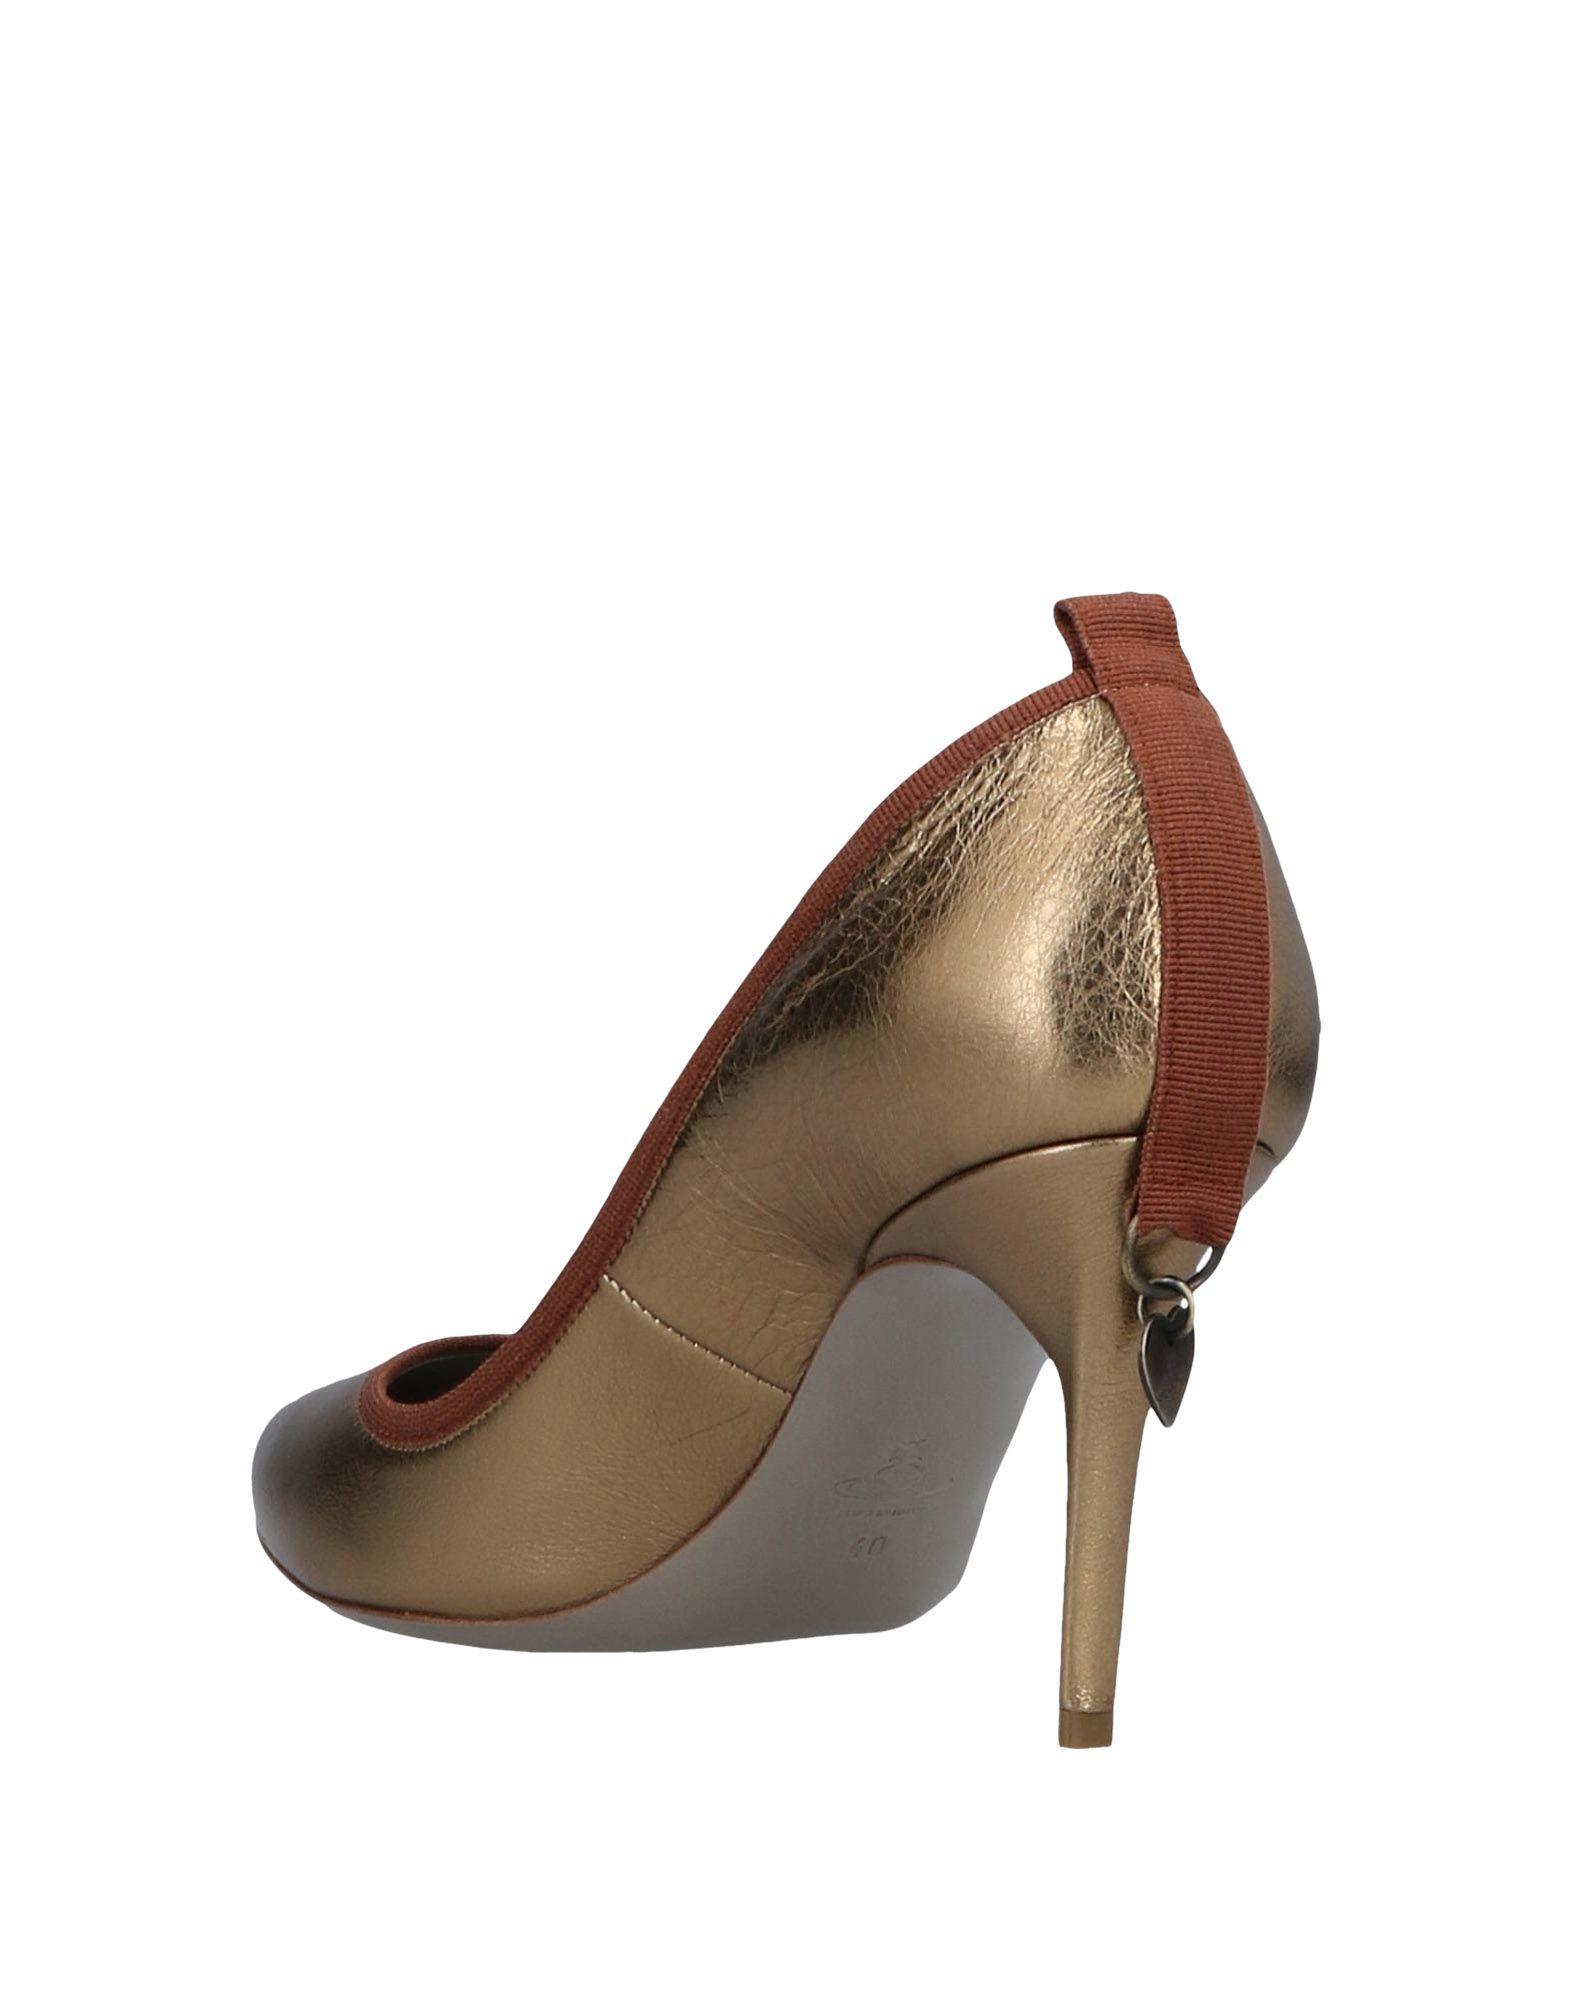 Stilvolle Anglomania billige Schuhe Vivienne Westwood Anglomania Stilvolle Pumps Damen  11521109PF a1c04a